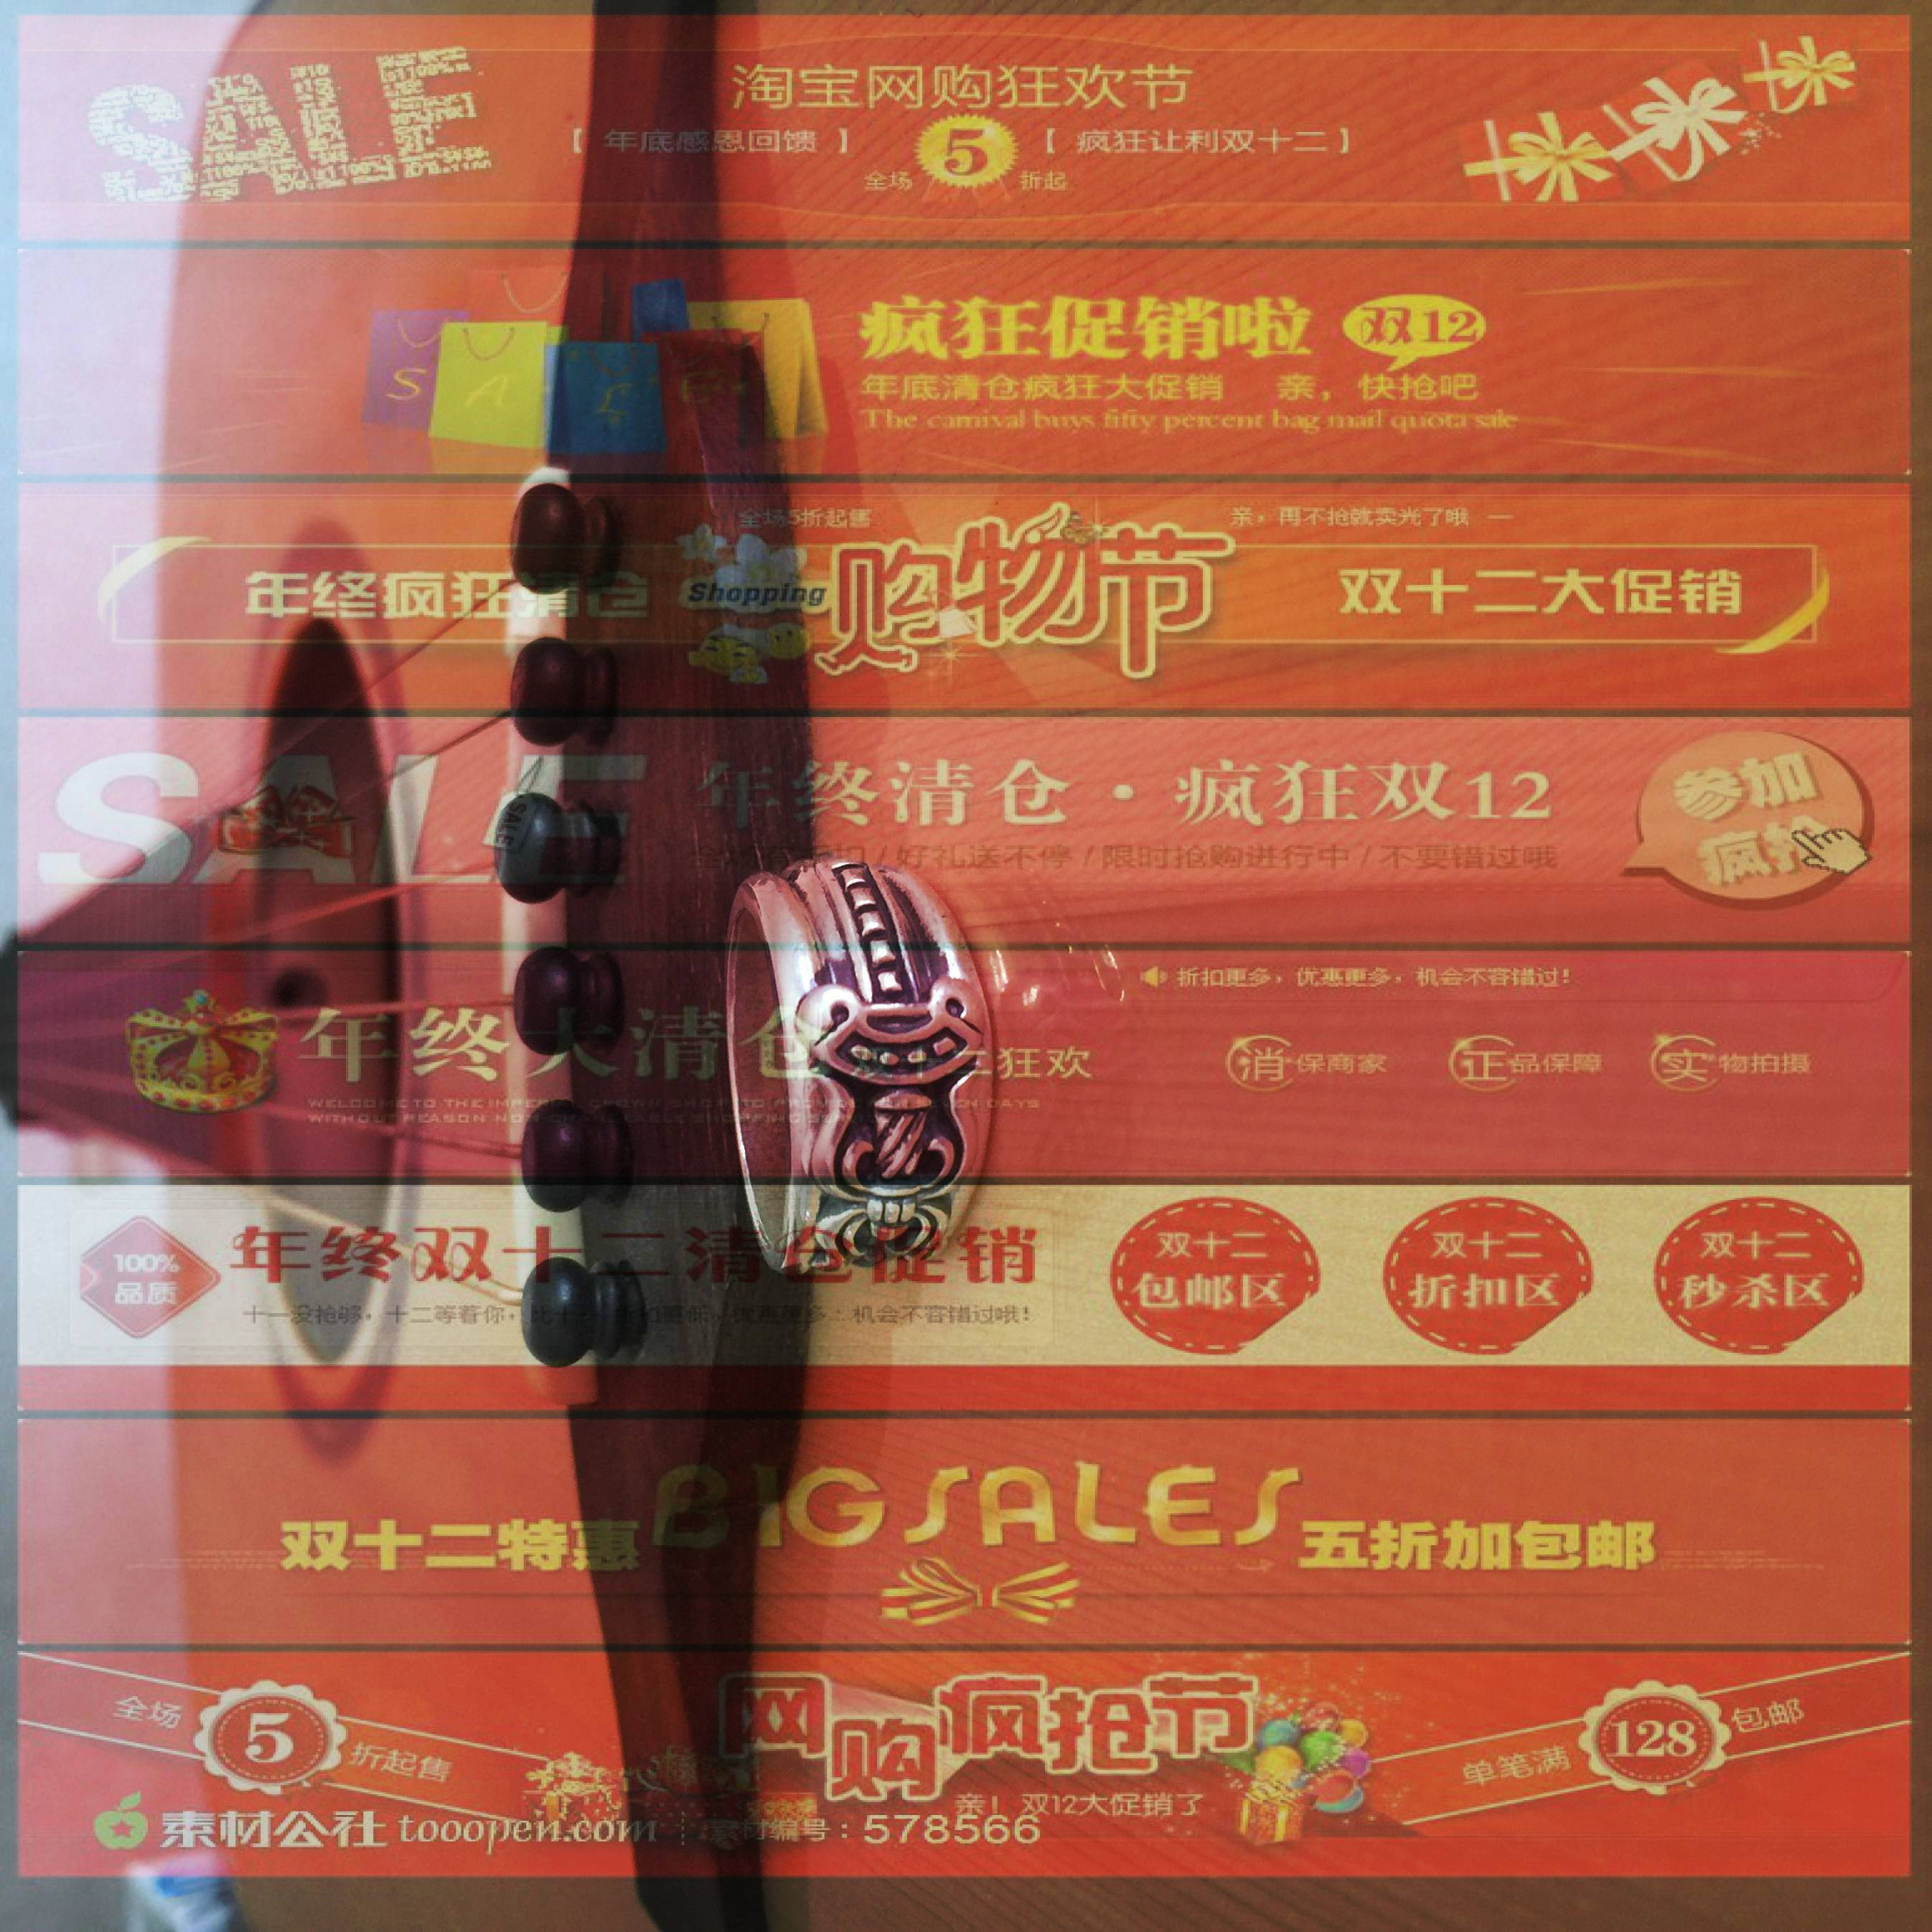 chrome hearts ring 00156 online headphone store